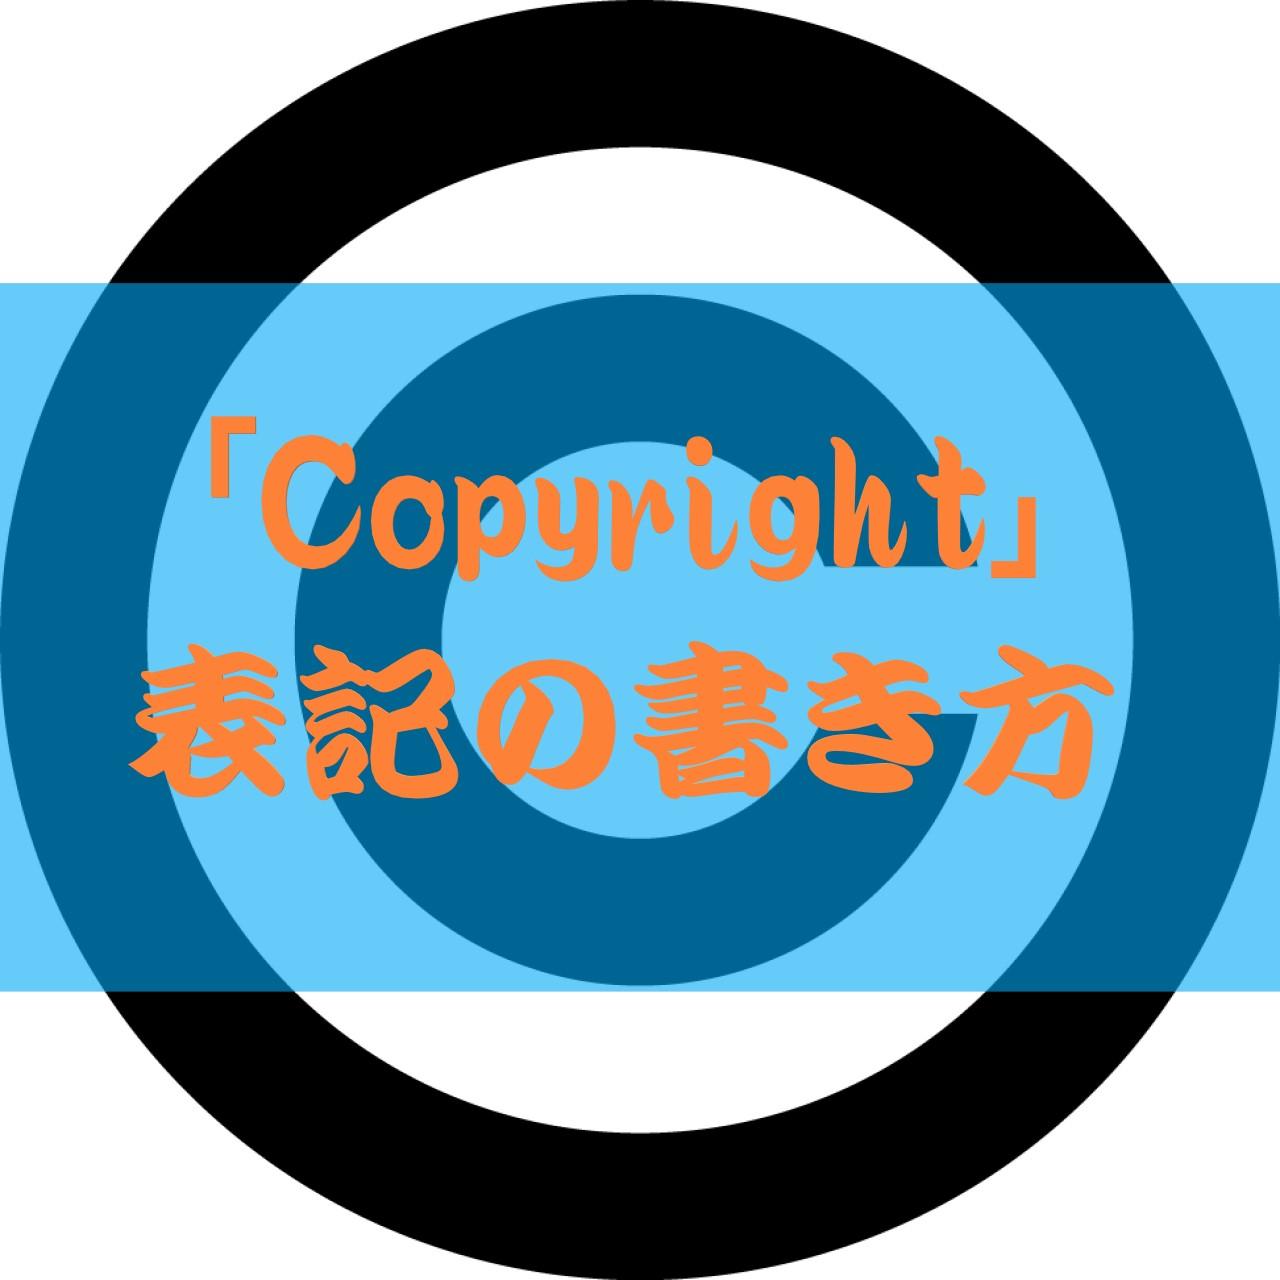 blog-copyright-notation